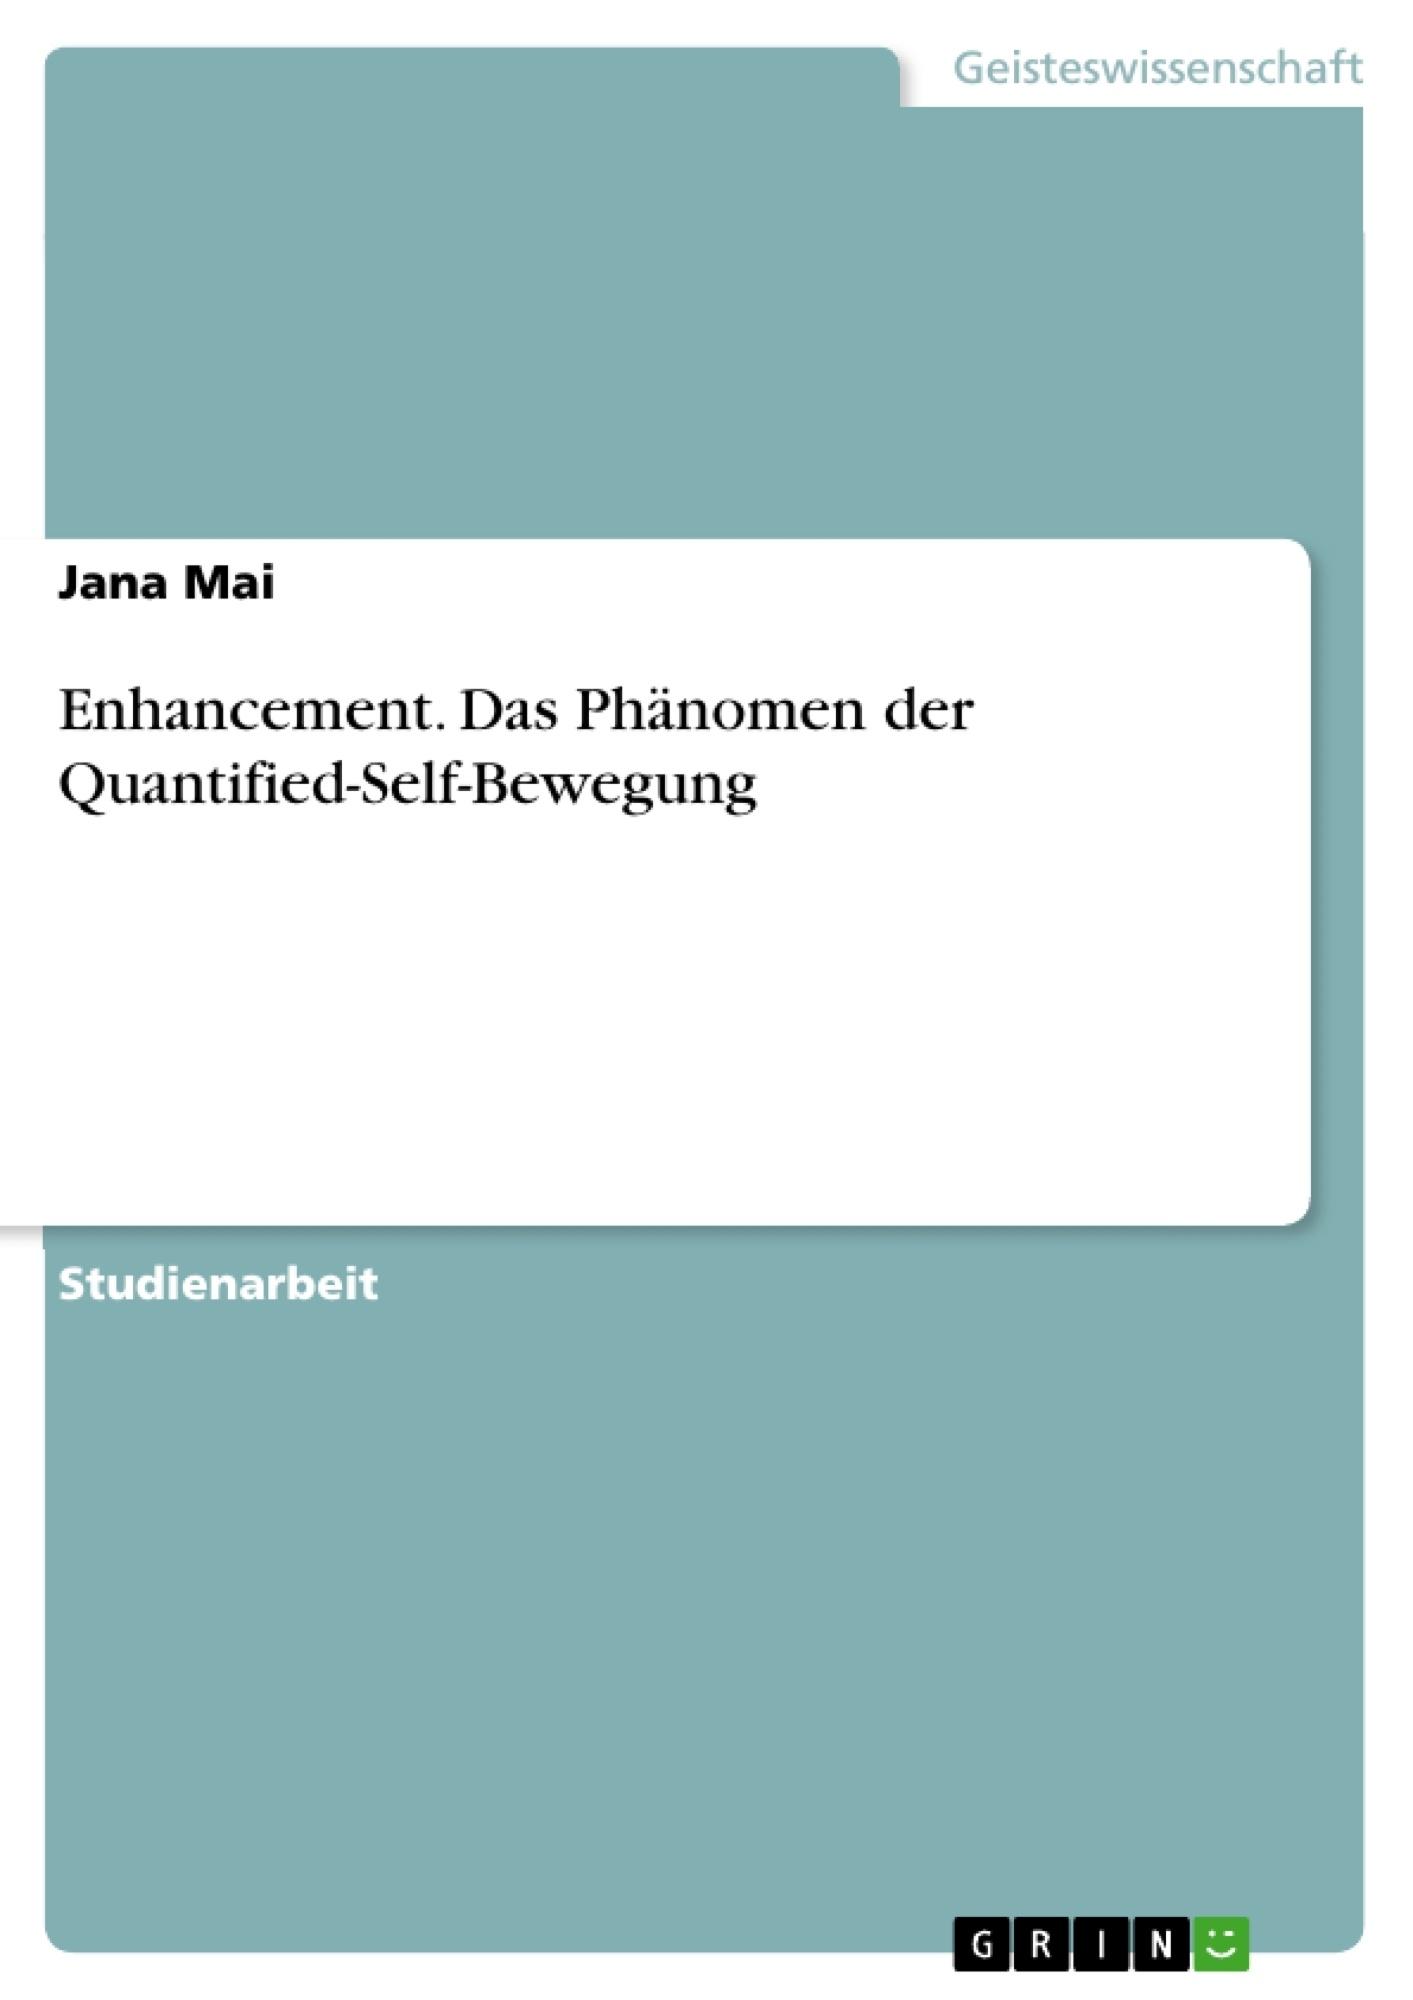 Titel: Enhancement. Das Phänomen der Quantified-Self-Bewegung